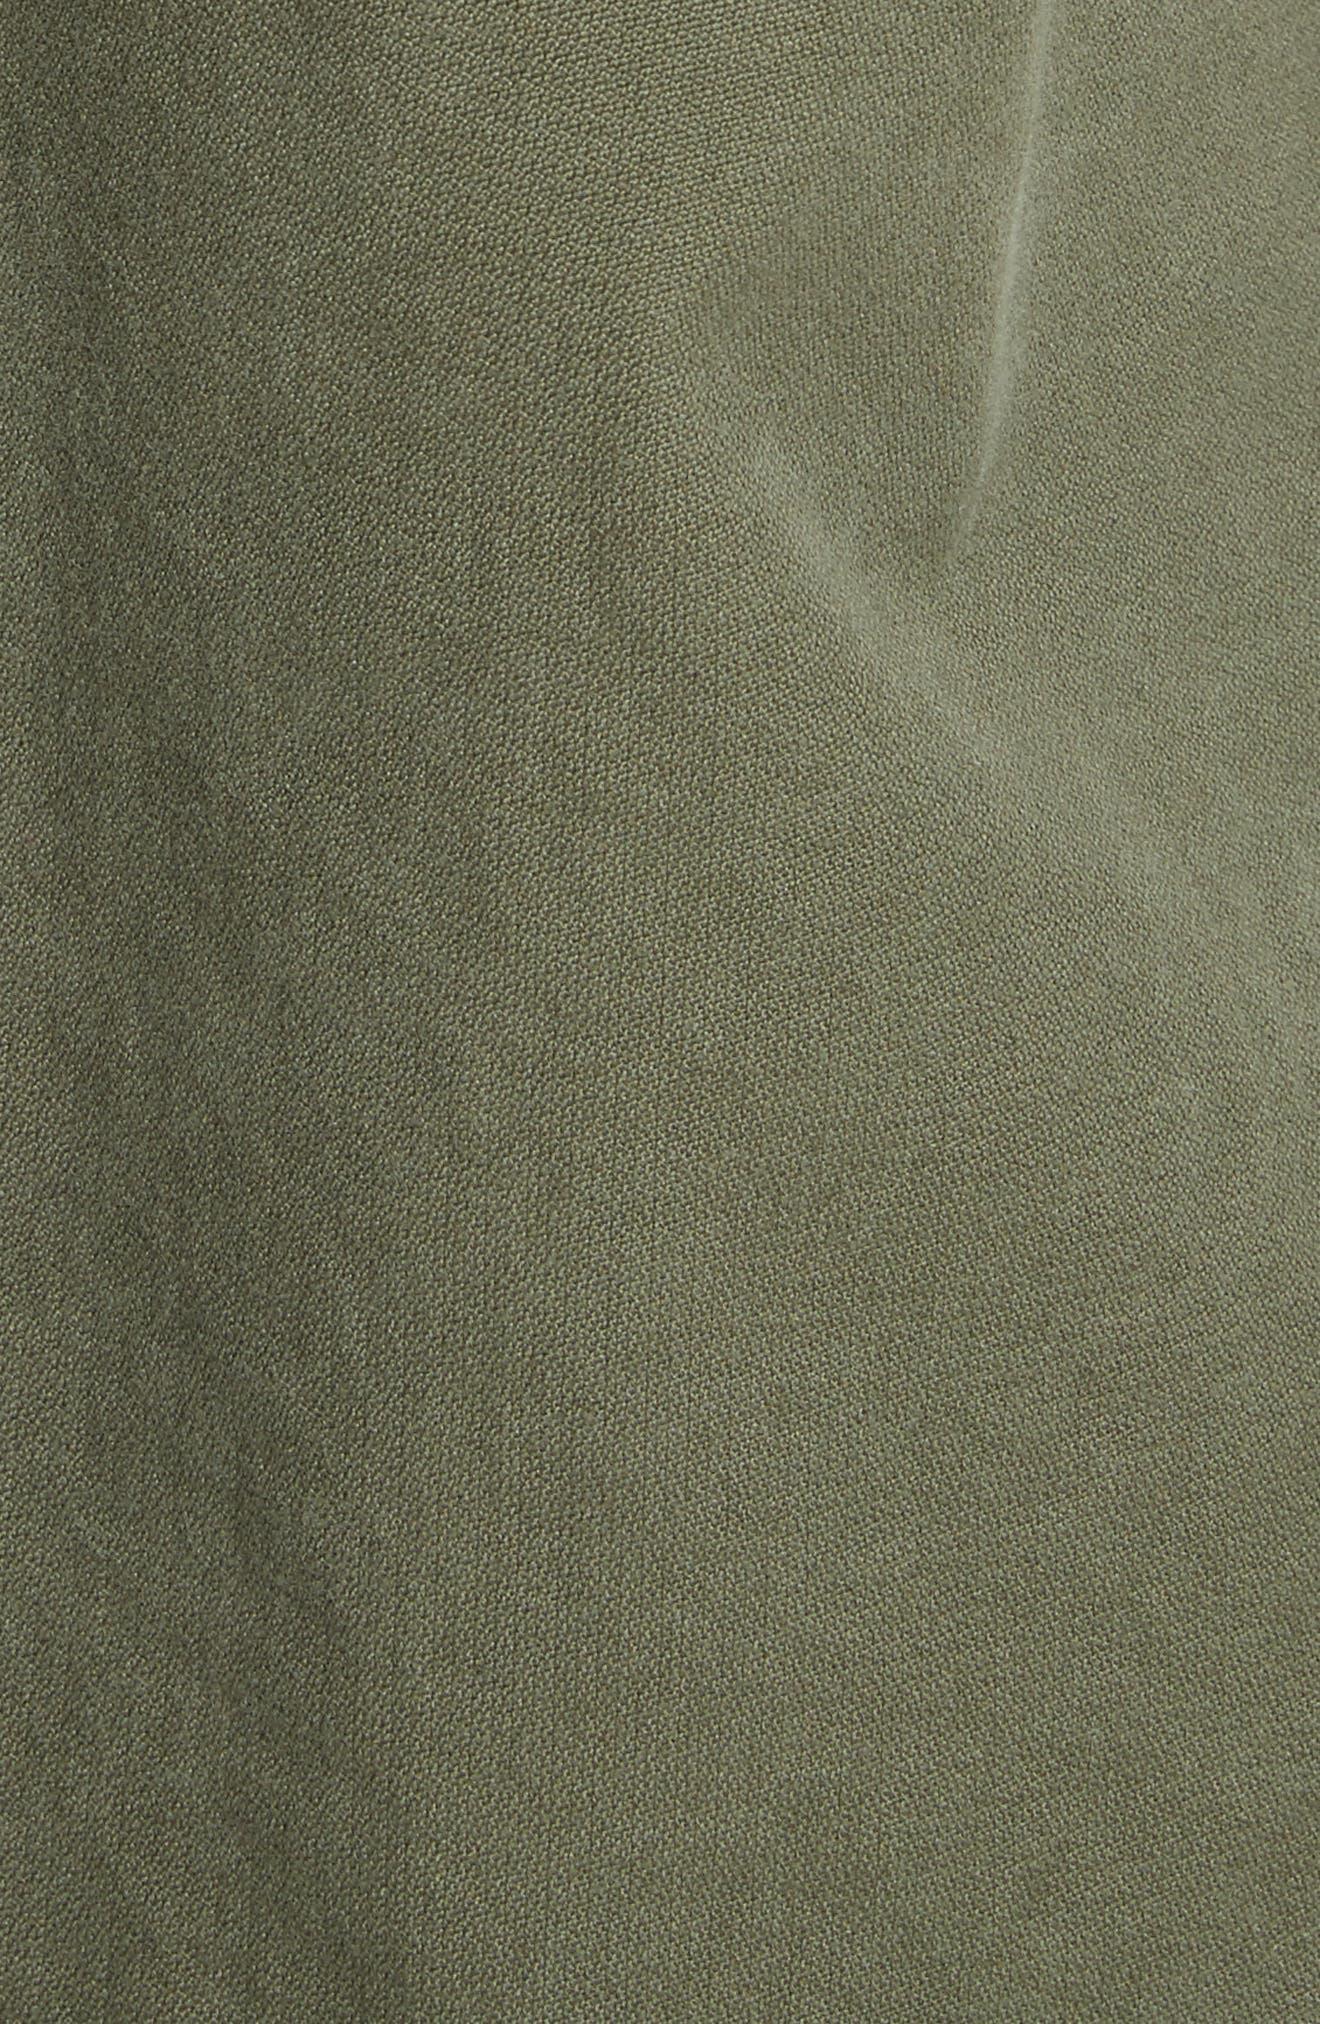 Army Coat with Cheetah Faux Fur Hood,                             Alternate thumbnail 6, color,                             340